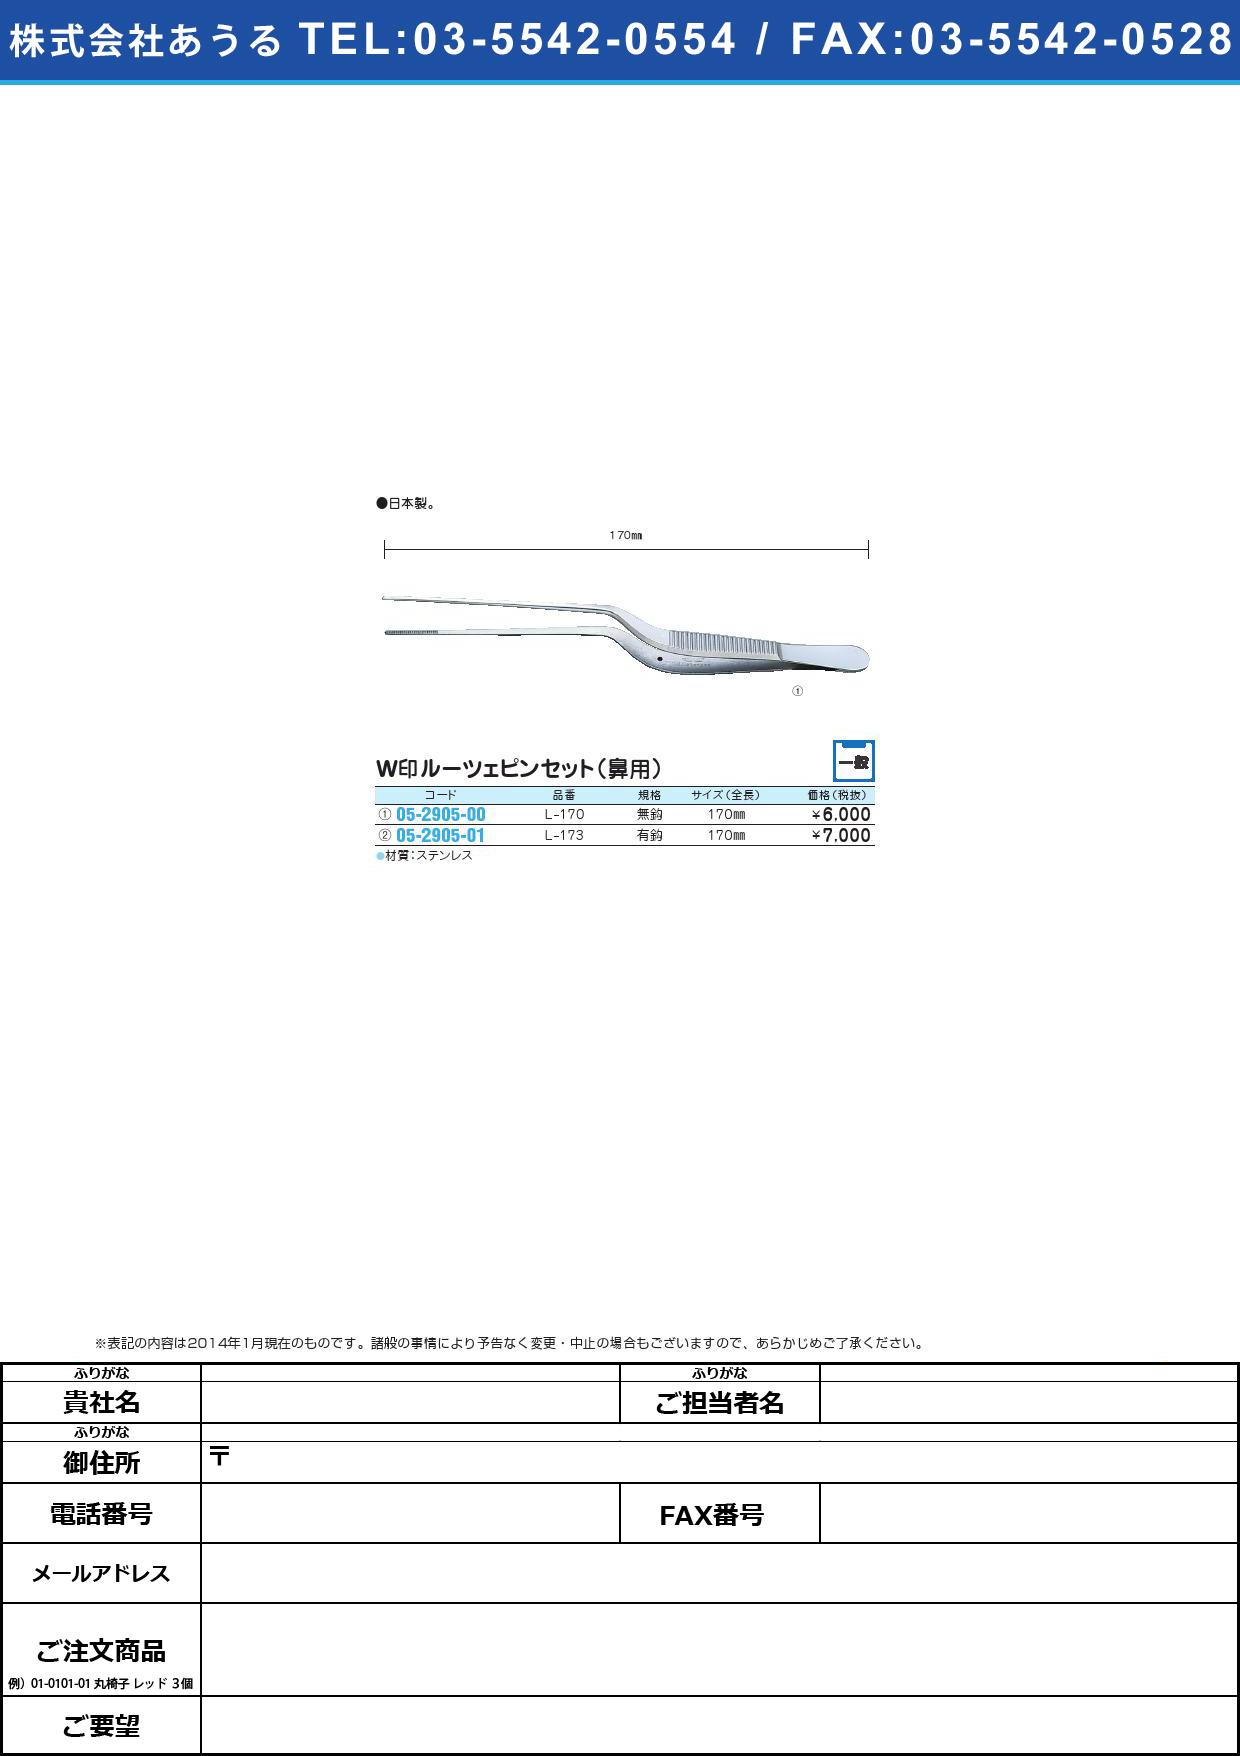 W印ルーツェピンセット(鼻用)無鈎 ピンセット L-170 (ステンレス) 170MM【1本単位】(05-2905-00)